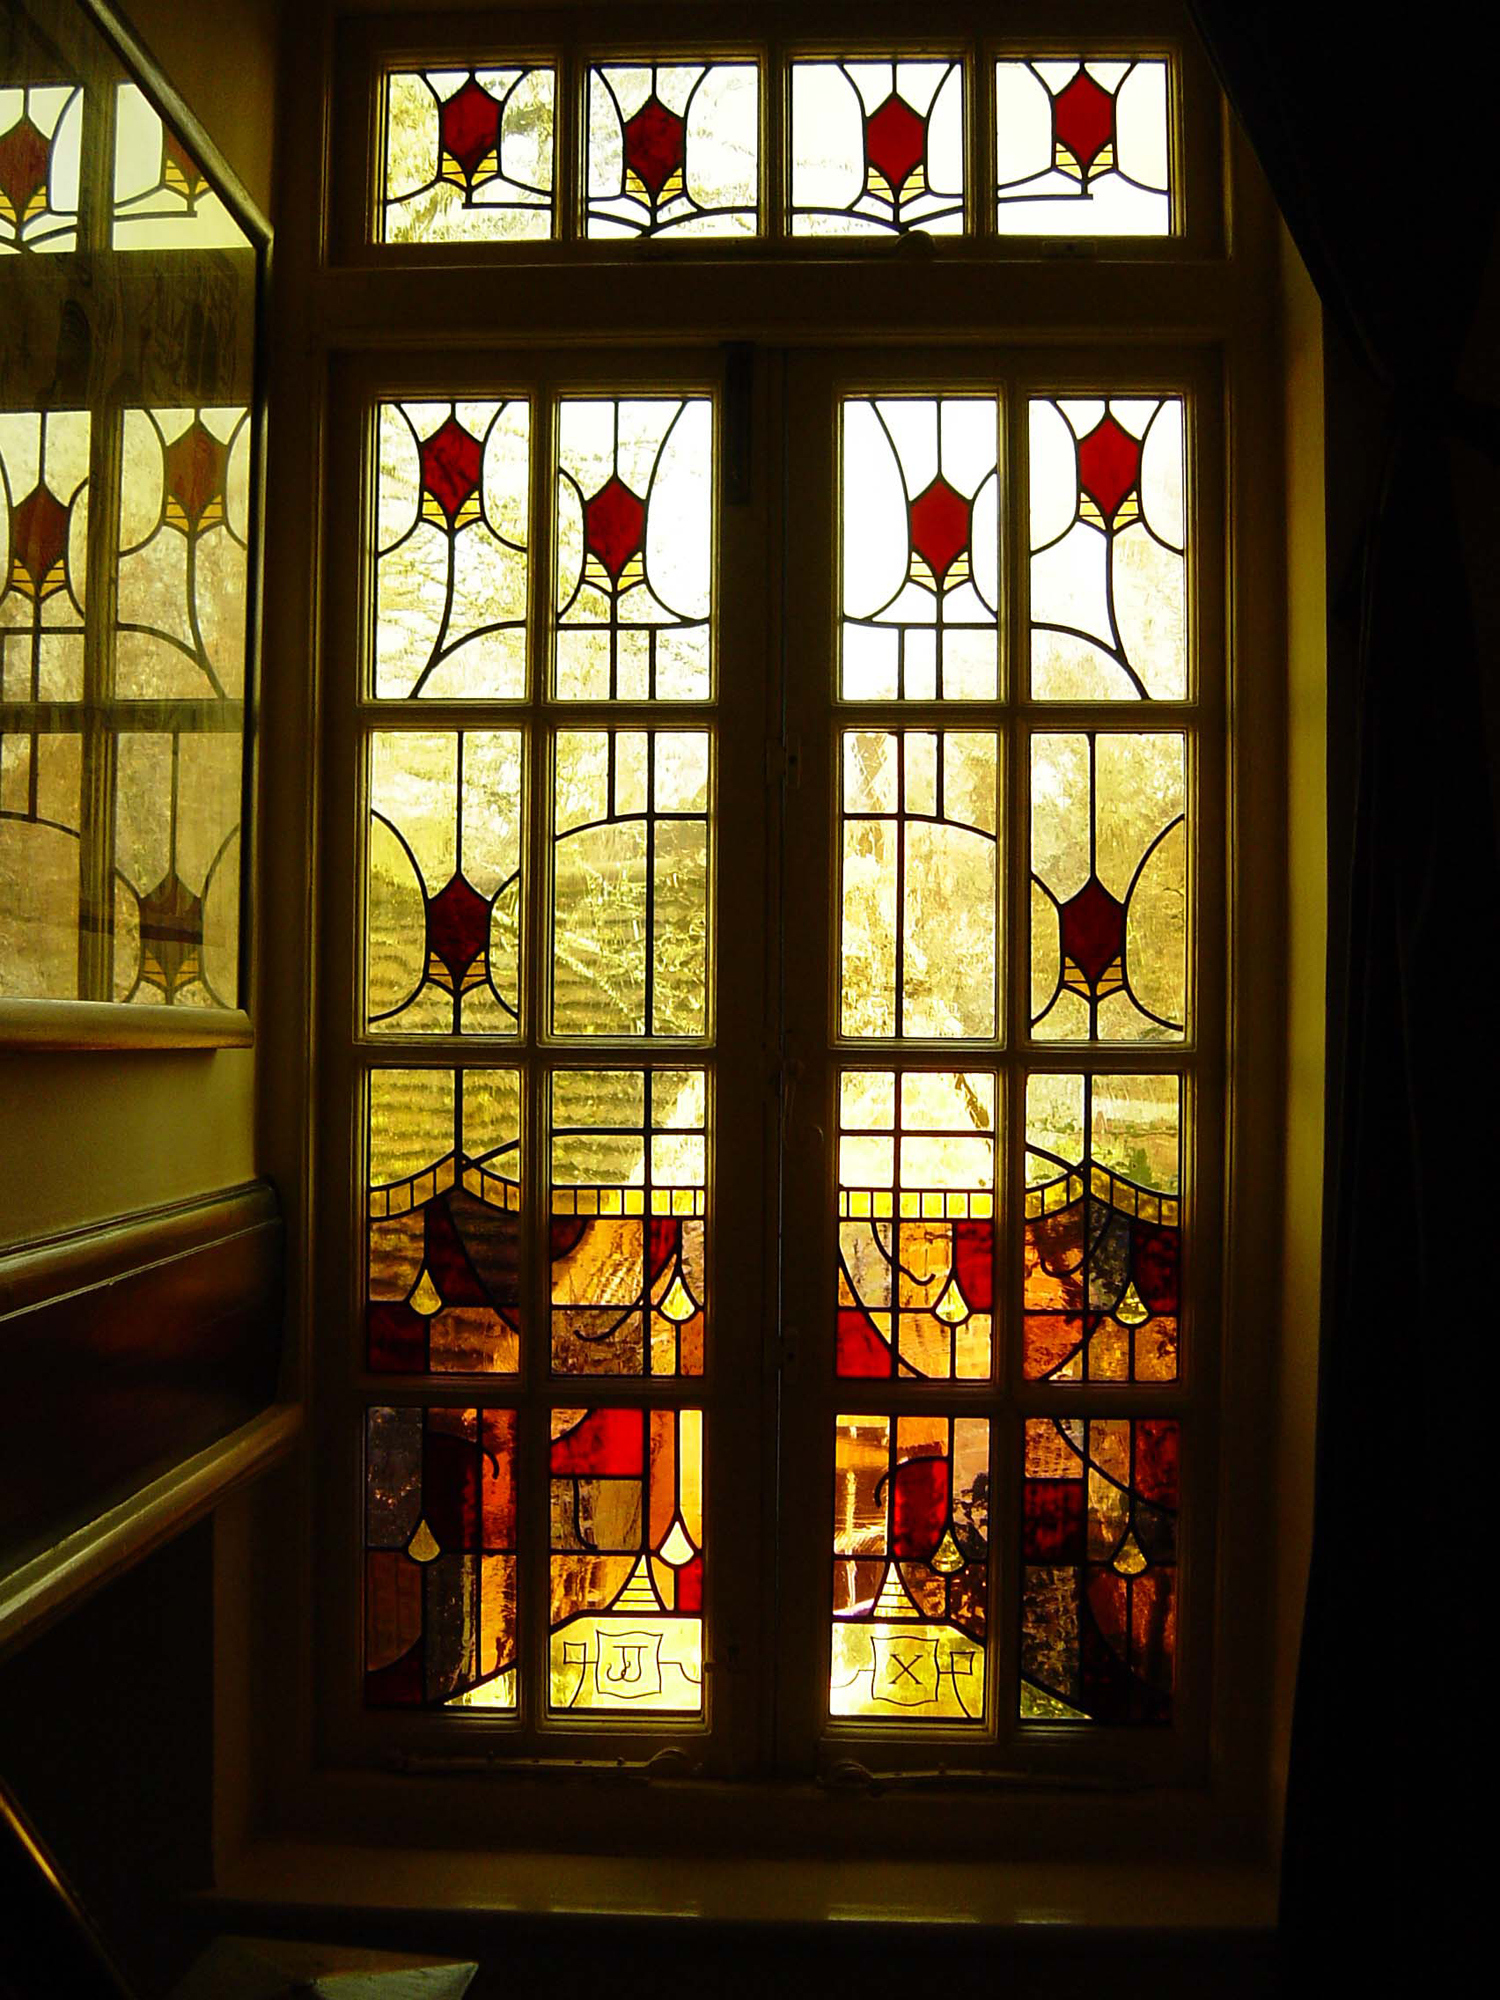 Window on stairs, Hampstead, London.